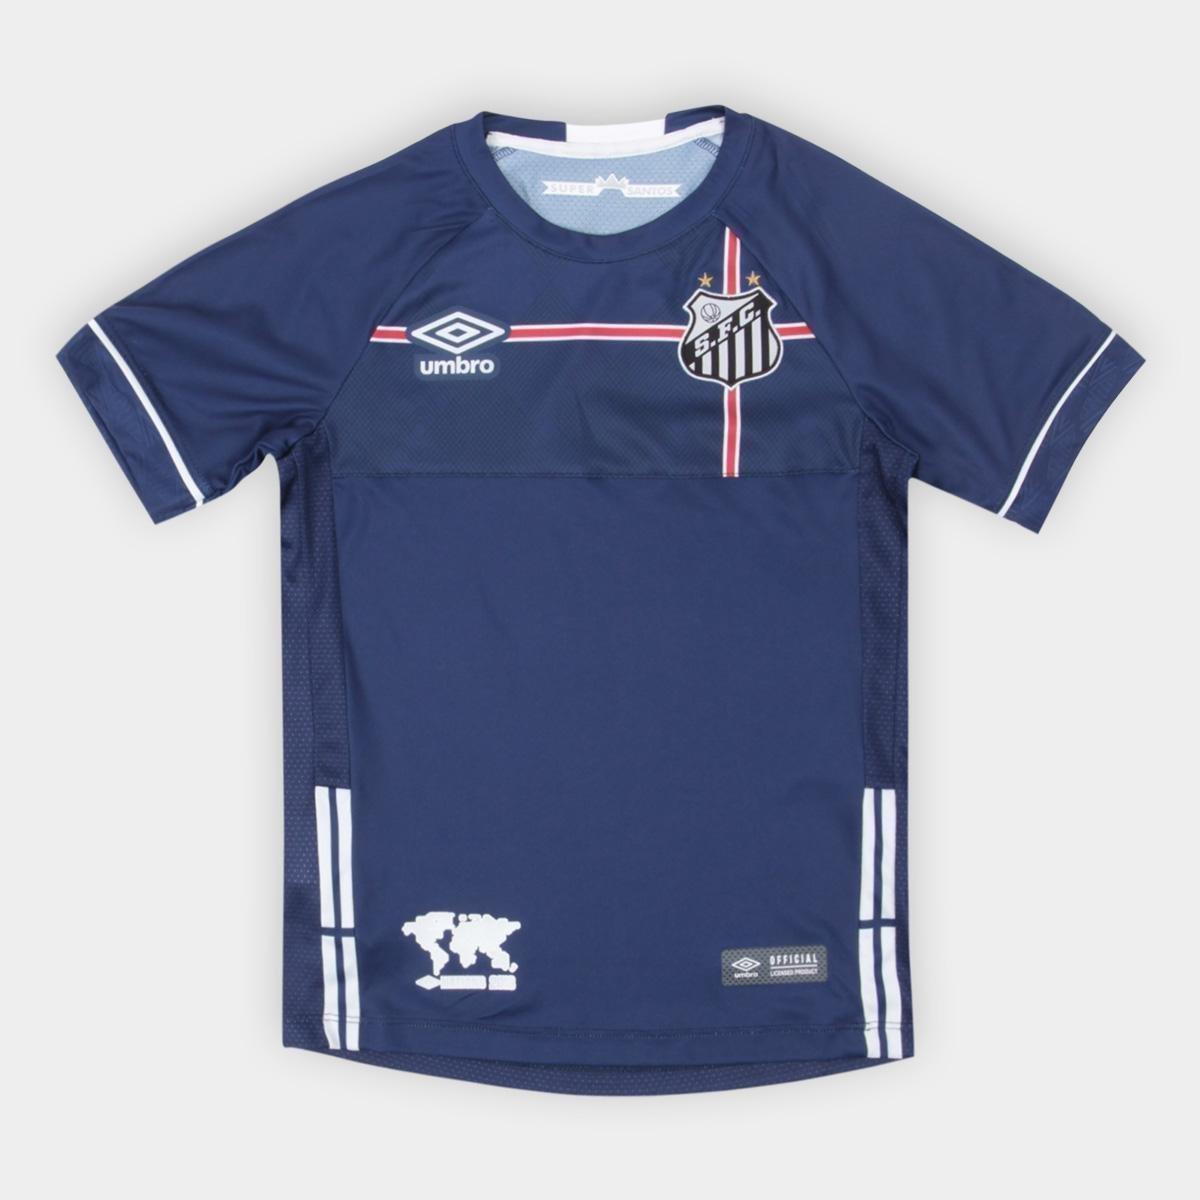 e Kingdom Umbro Santos The 2018 n° Infantil Camisa Marinho Torcedor s Branco OBnpxvHv8W